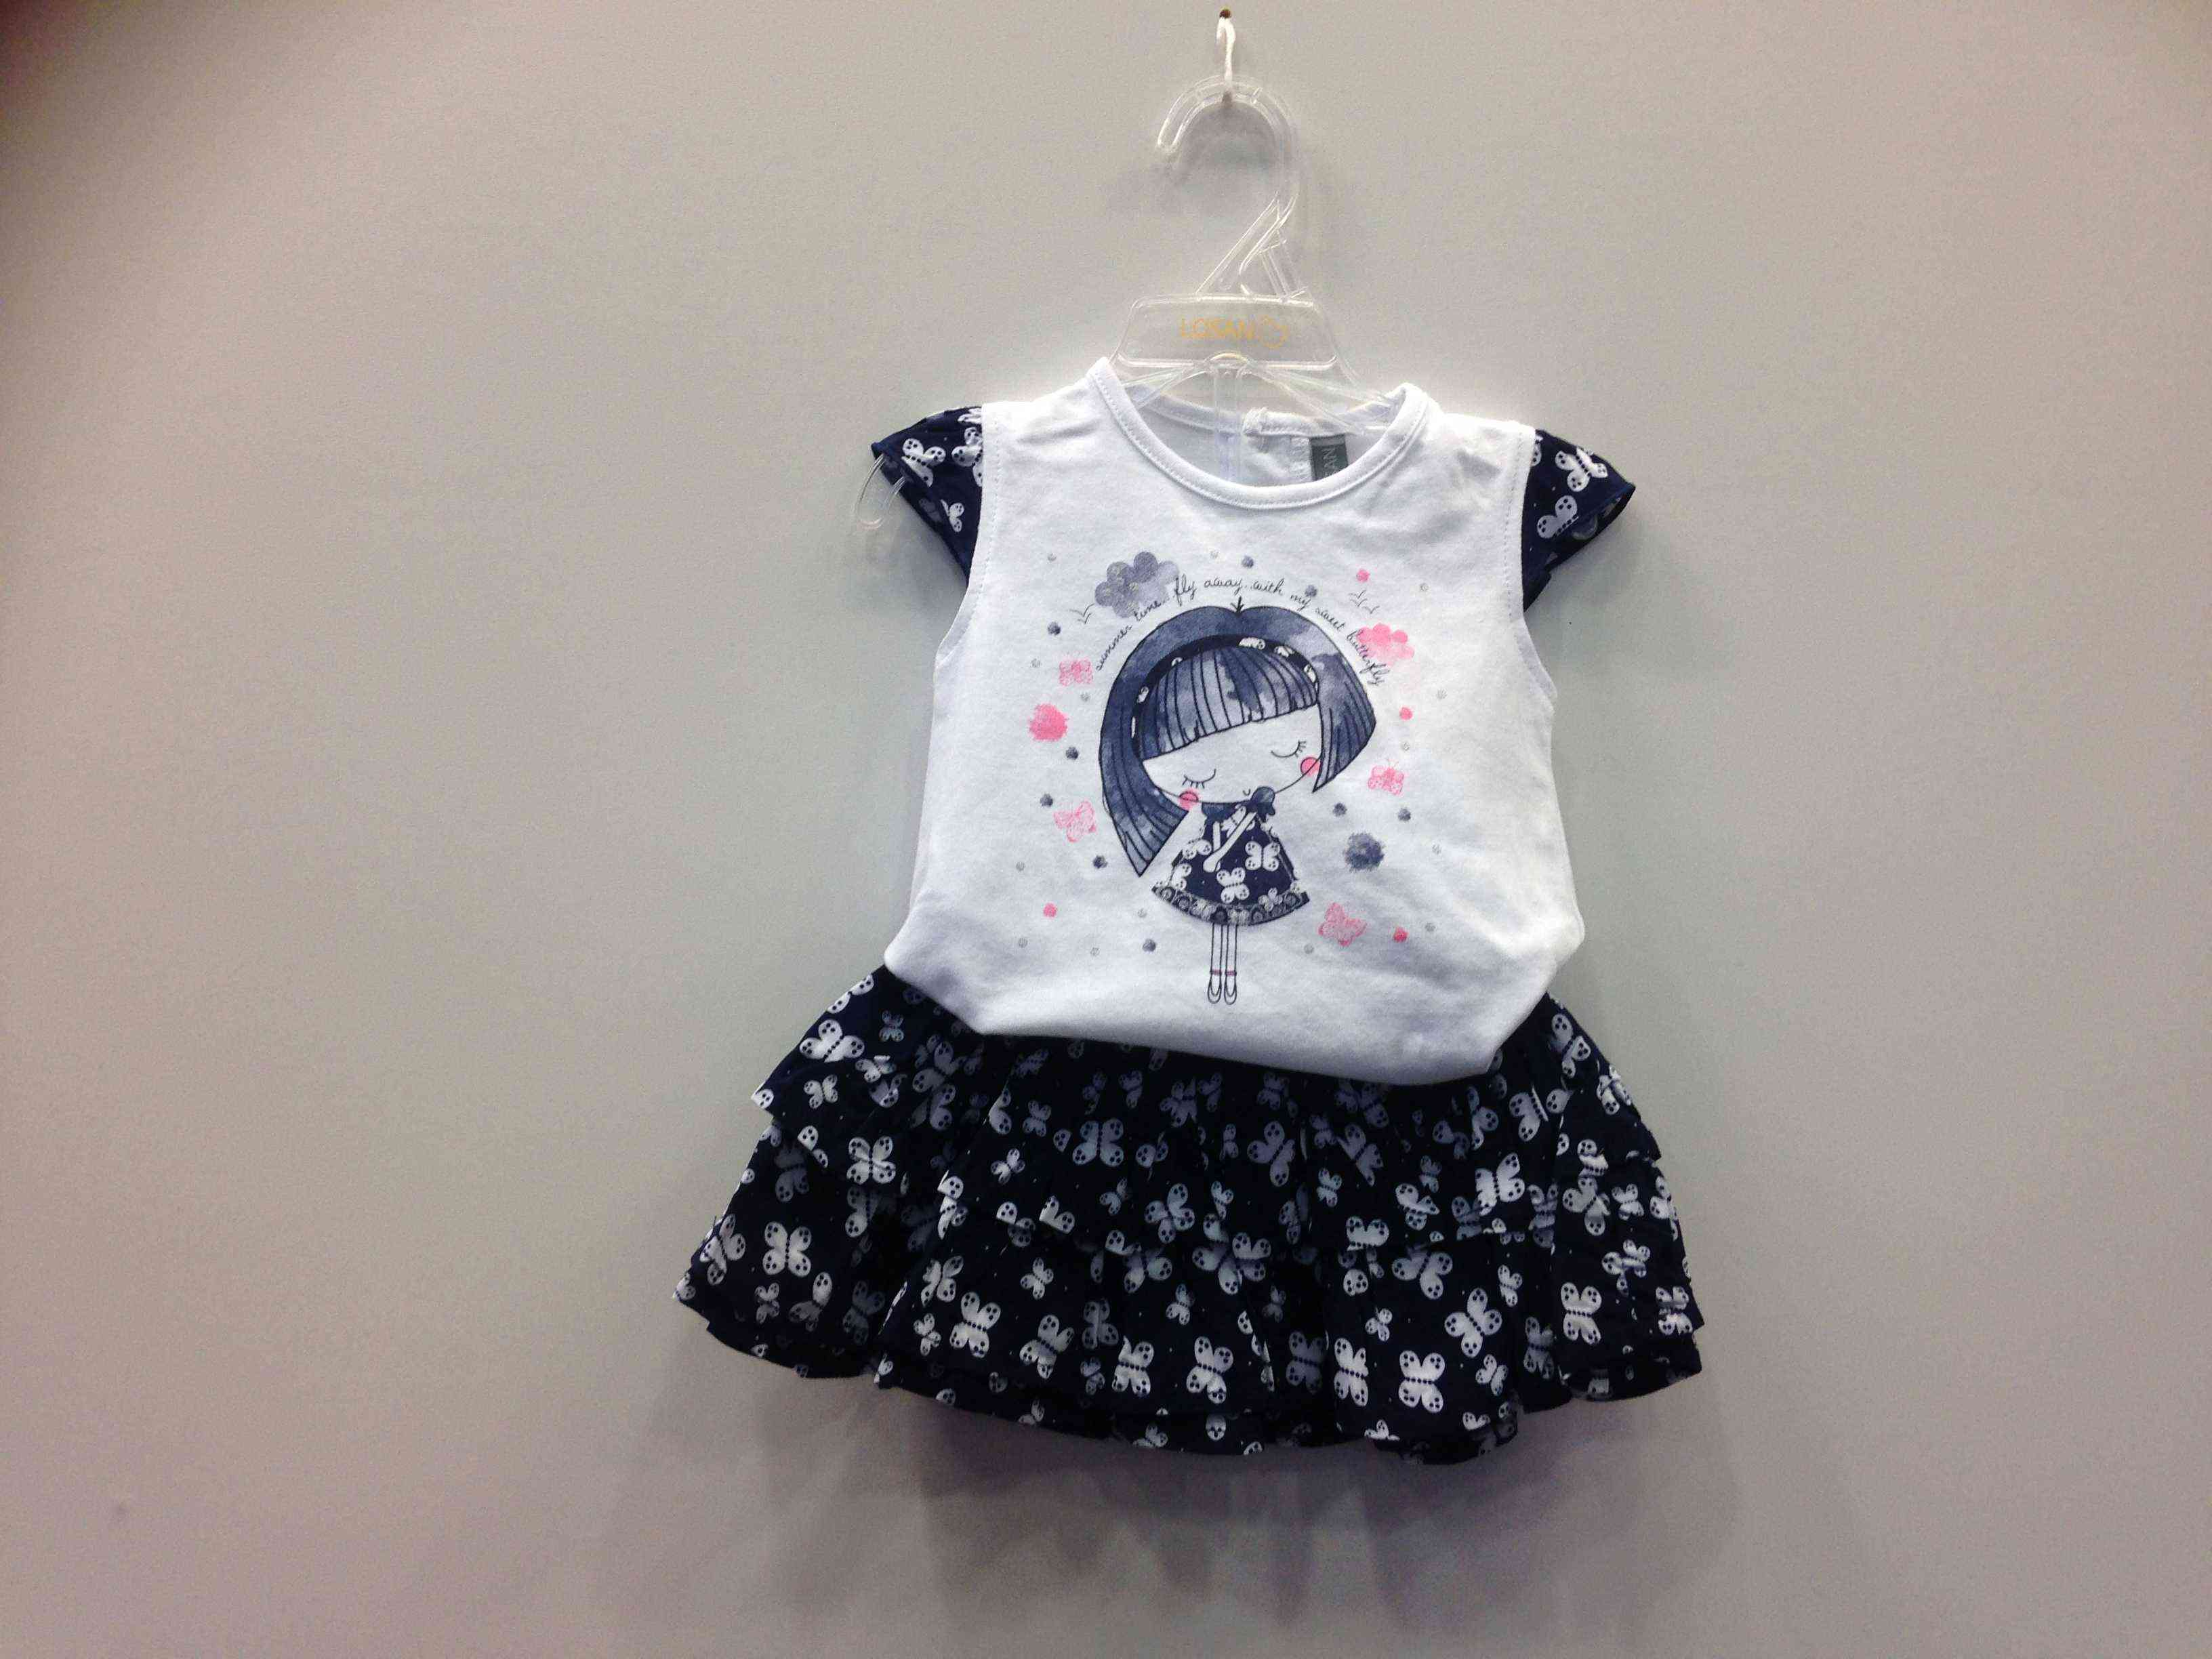 bf33144568b LOSAN Σετ μπλούζα/φούστα με πεταλούδες 100% viscose έξω,100% cotton μέσα